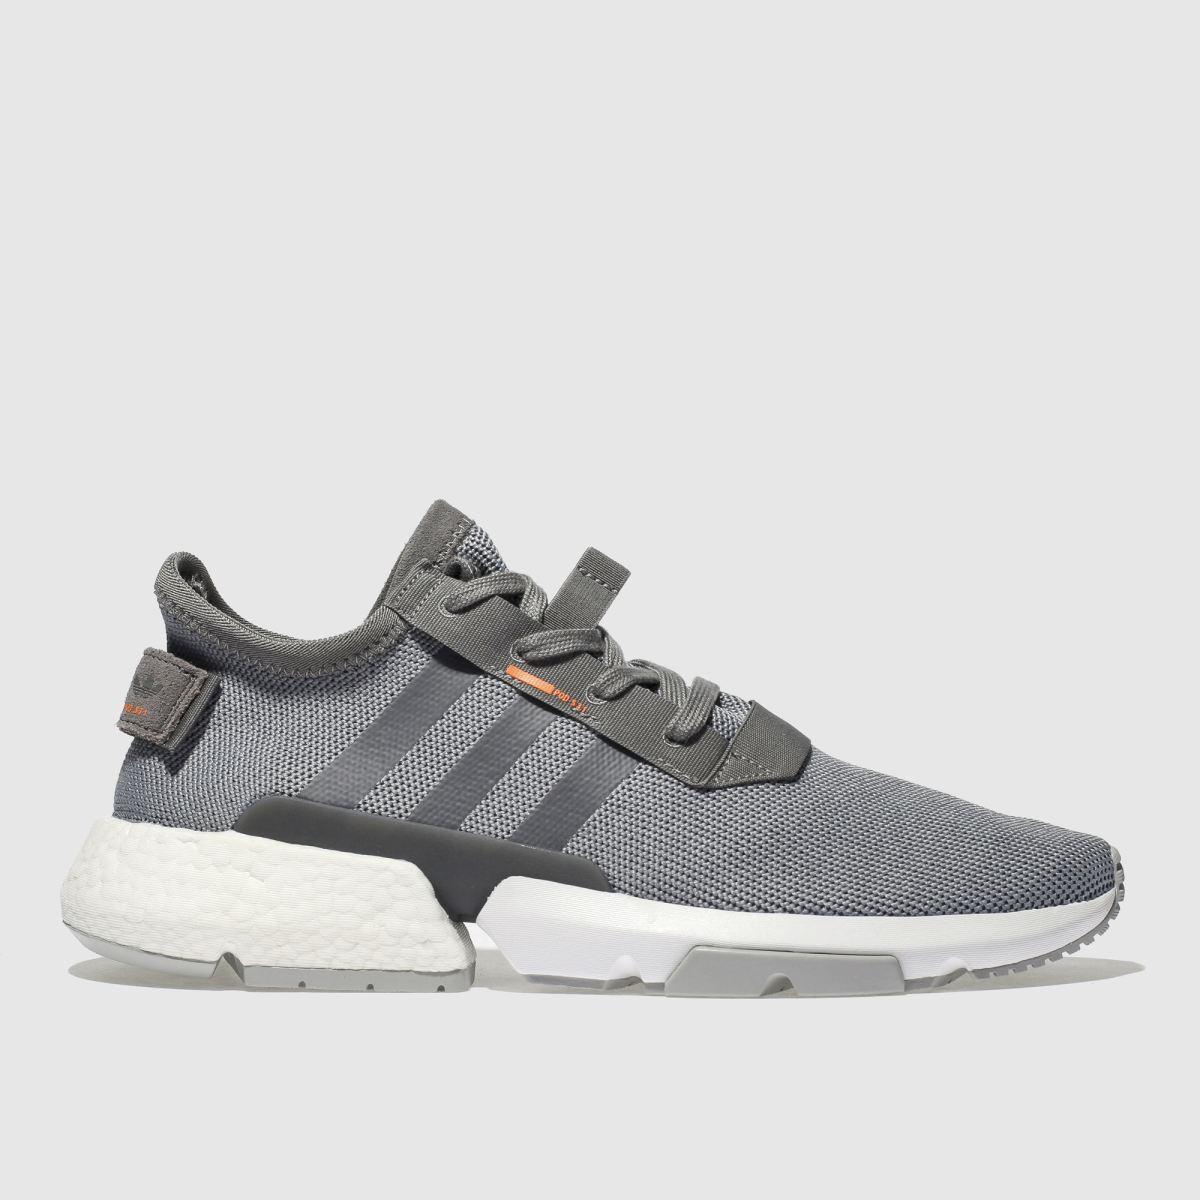 Adidas Grey Pod-s3.1 Trainers